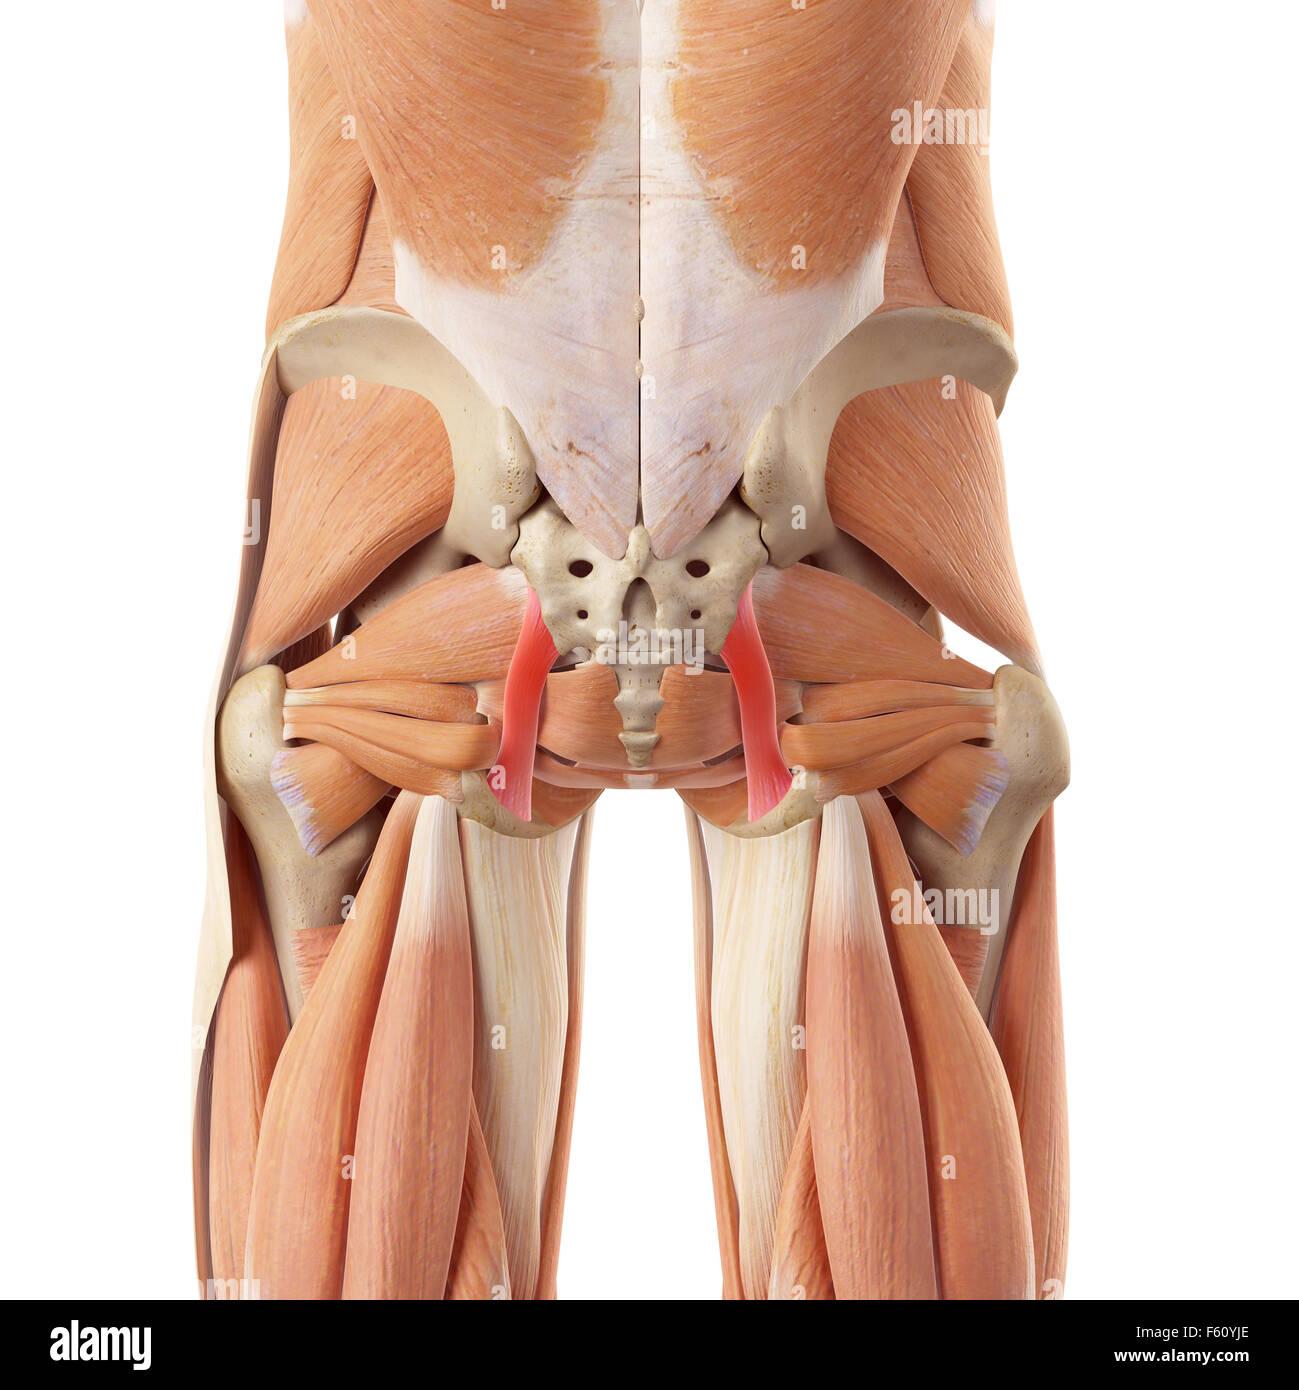 Pelvic Ligament Stock Photos & Pelvic Ligament Stock Images - Alamy